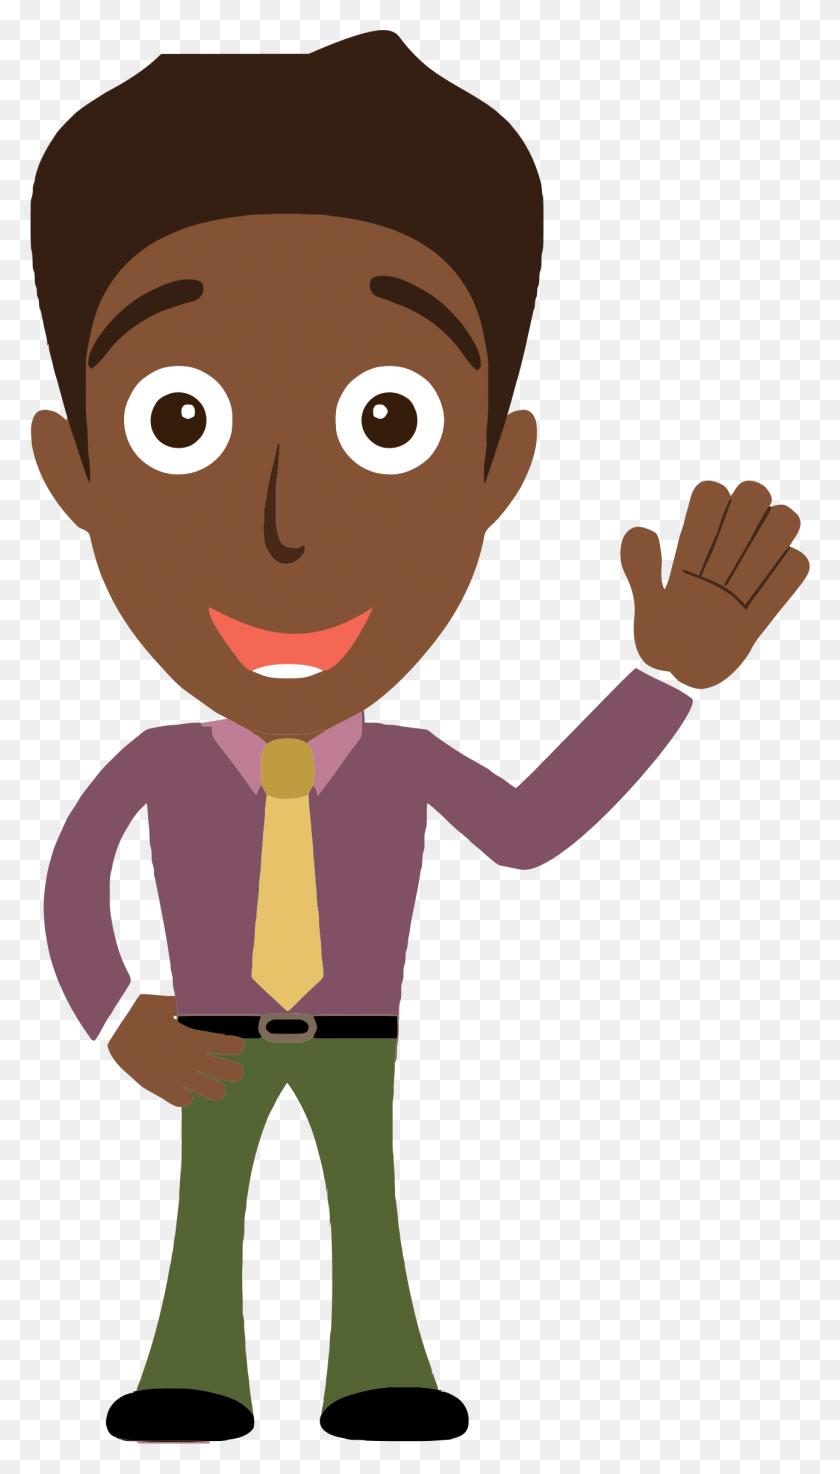 Person Clipart Png Clip Art Images - Person Clipart PNG